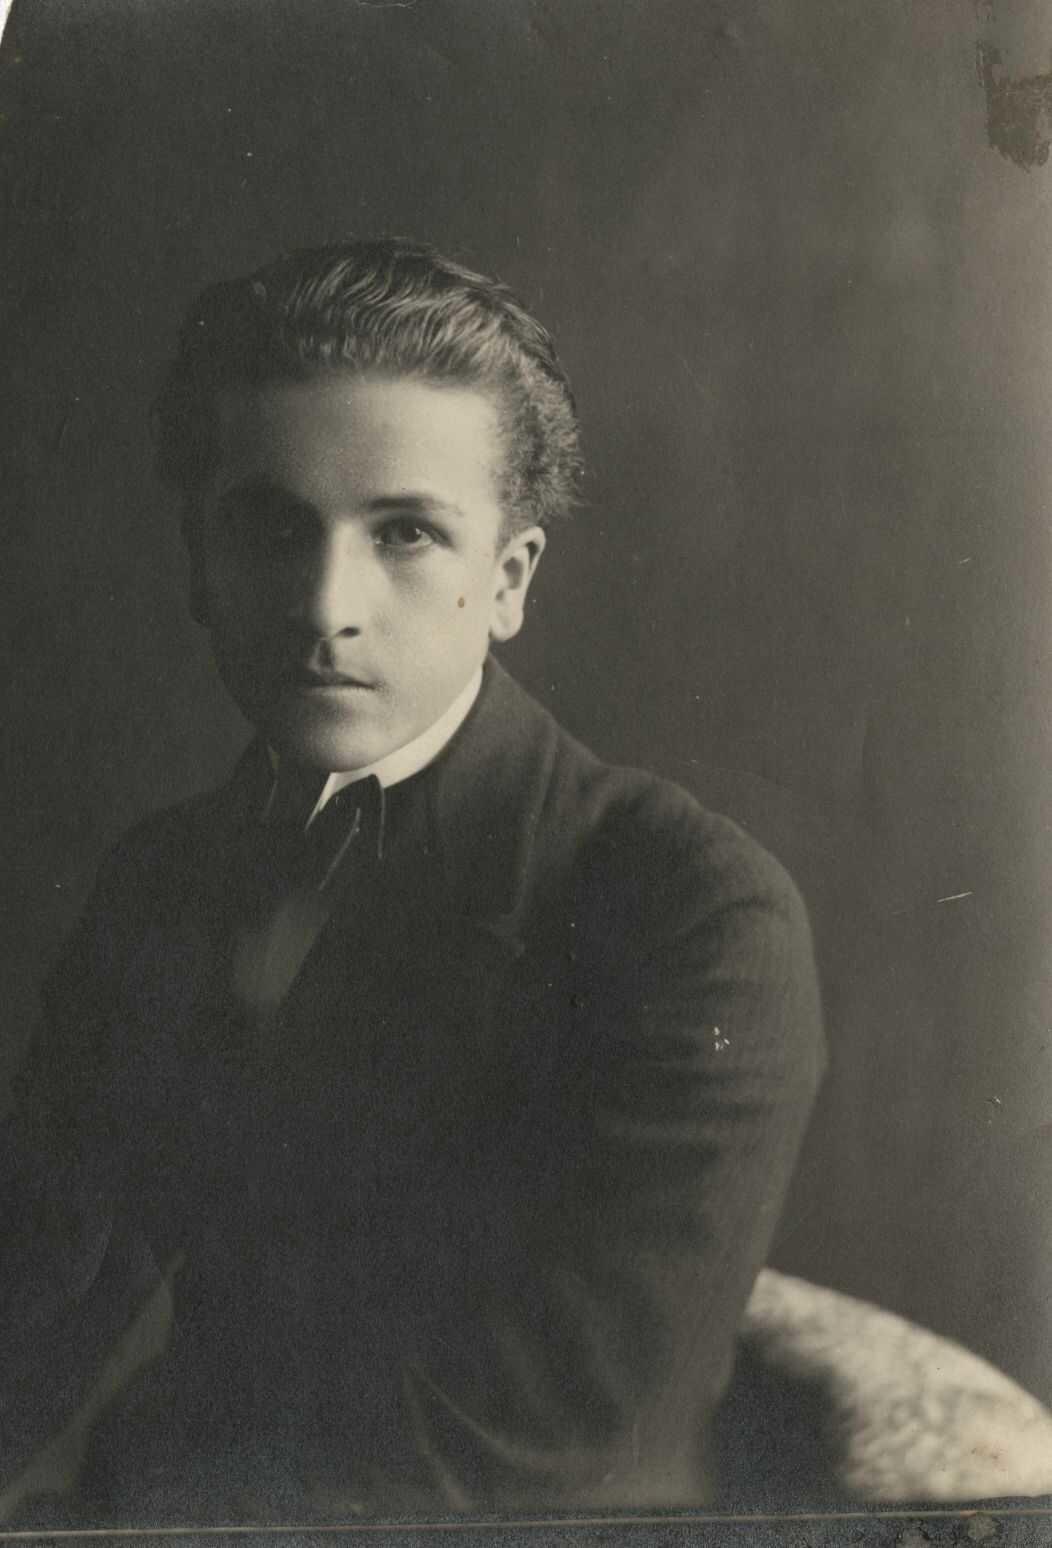 image for Gangotena, Alfredo (1904-1944)